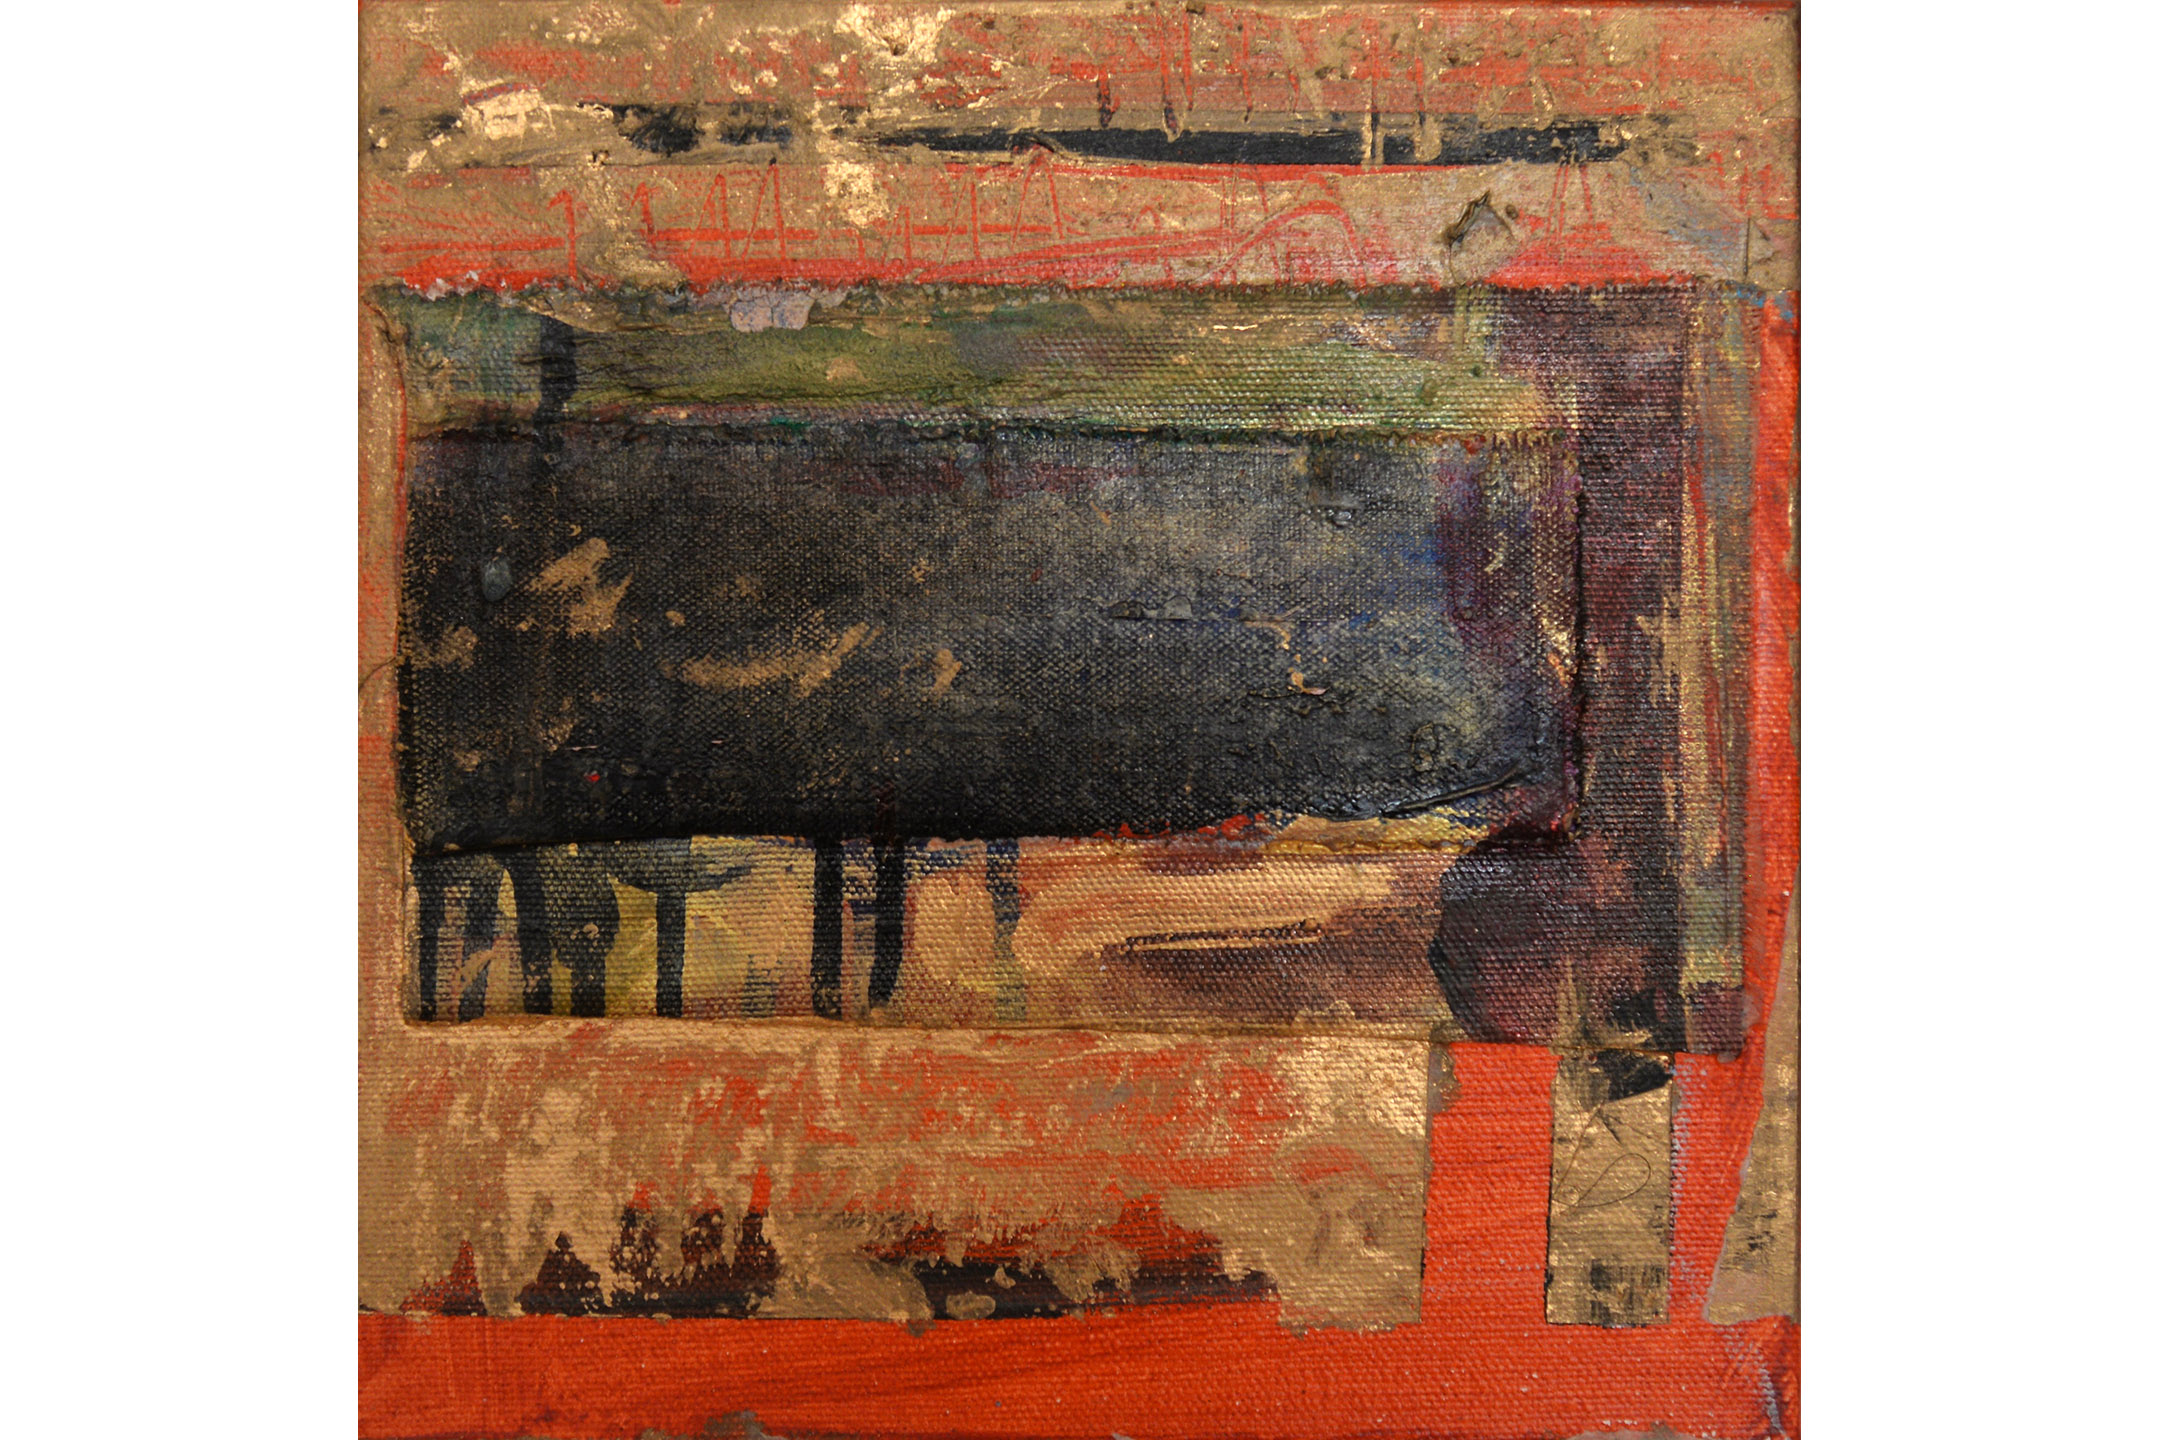 "Basia Goldsmith, Untitled, Mixed media on canvas, 8"" x 8"", 2016"